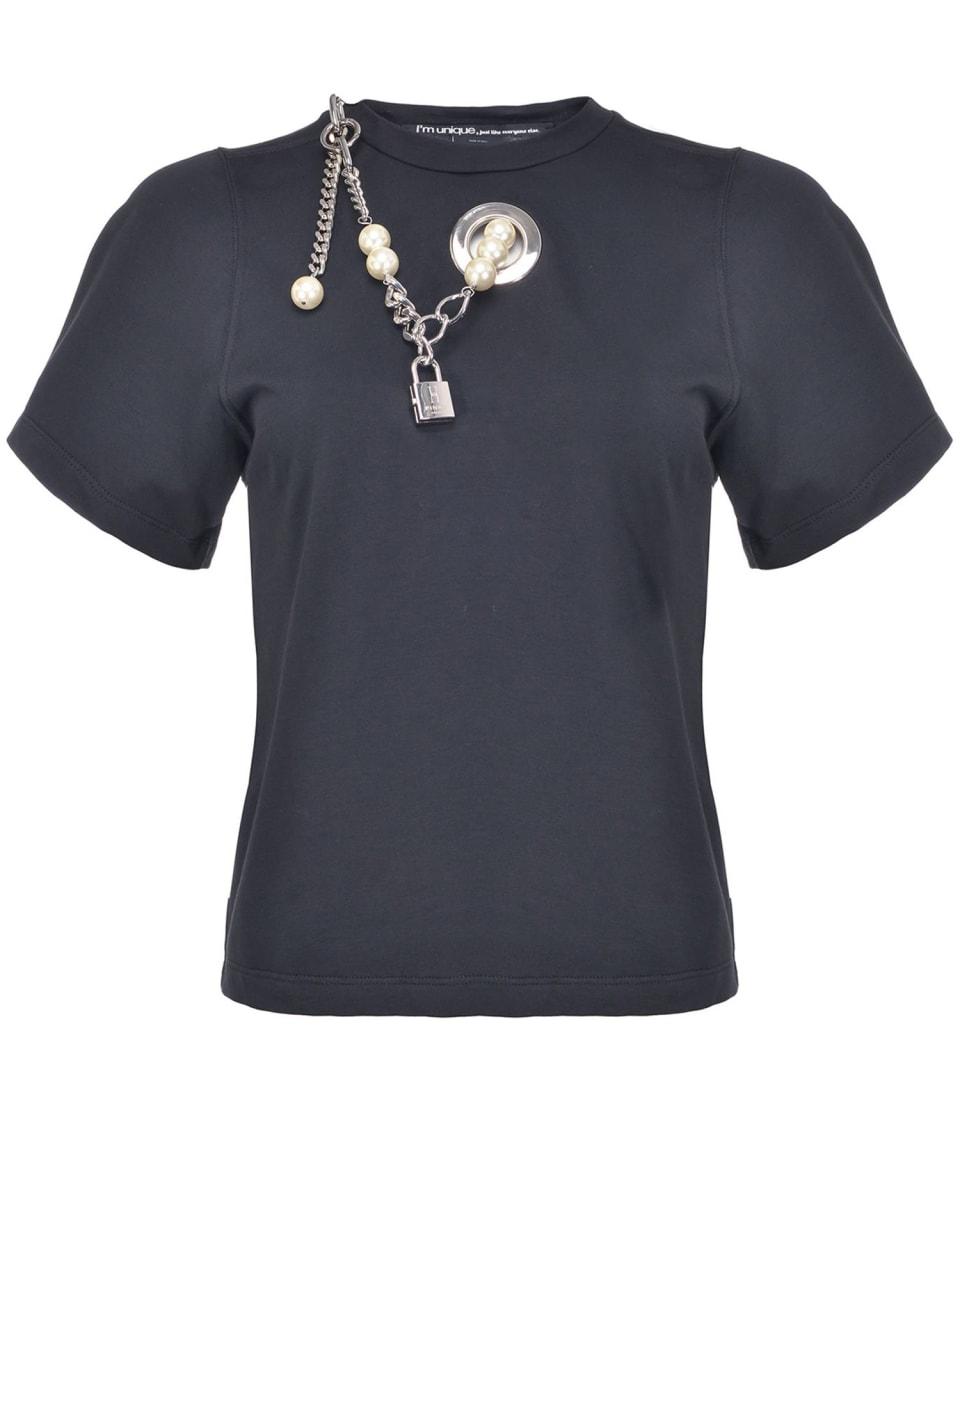 T-shirt con perle